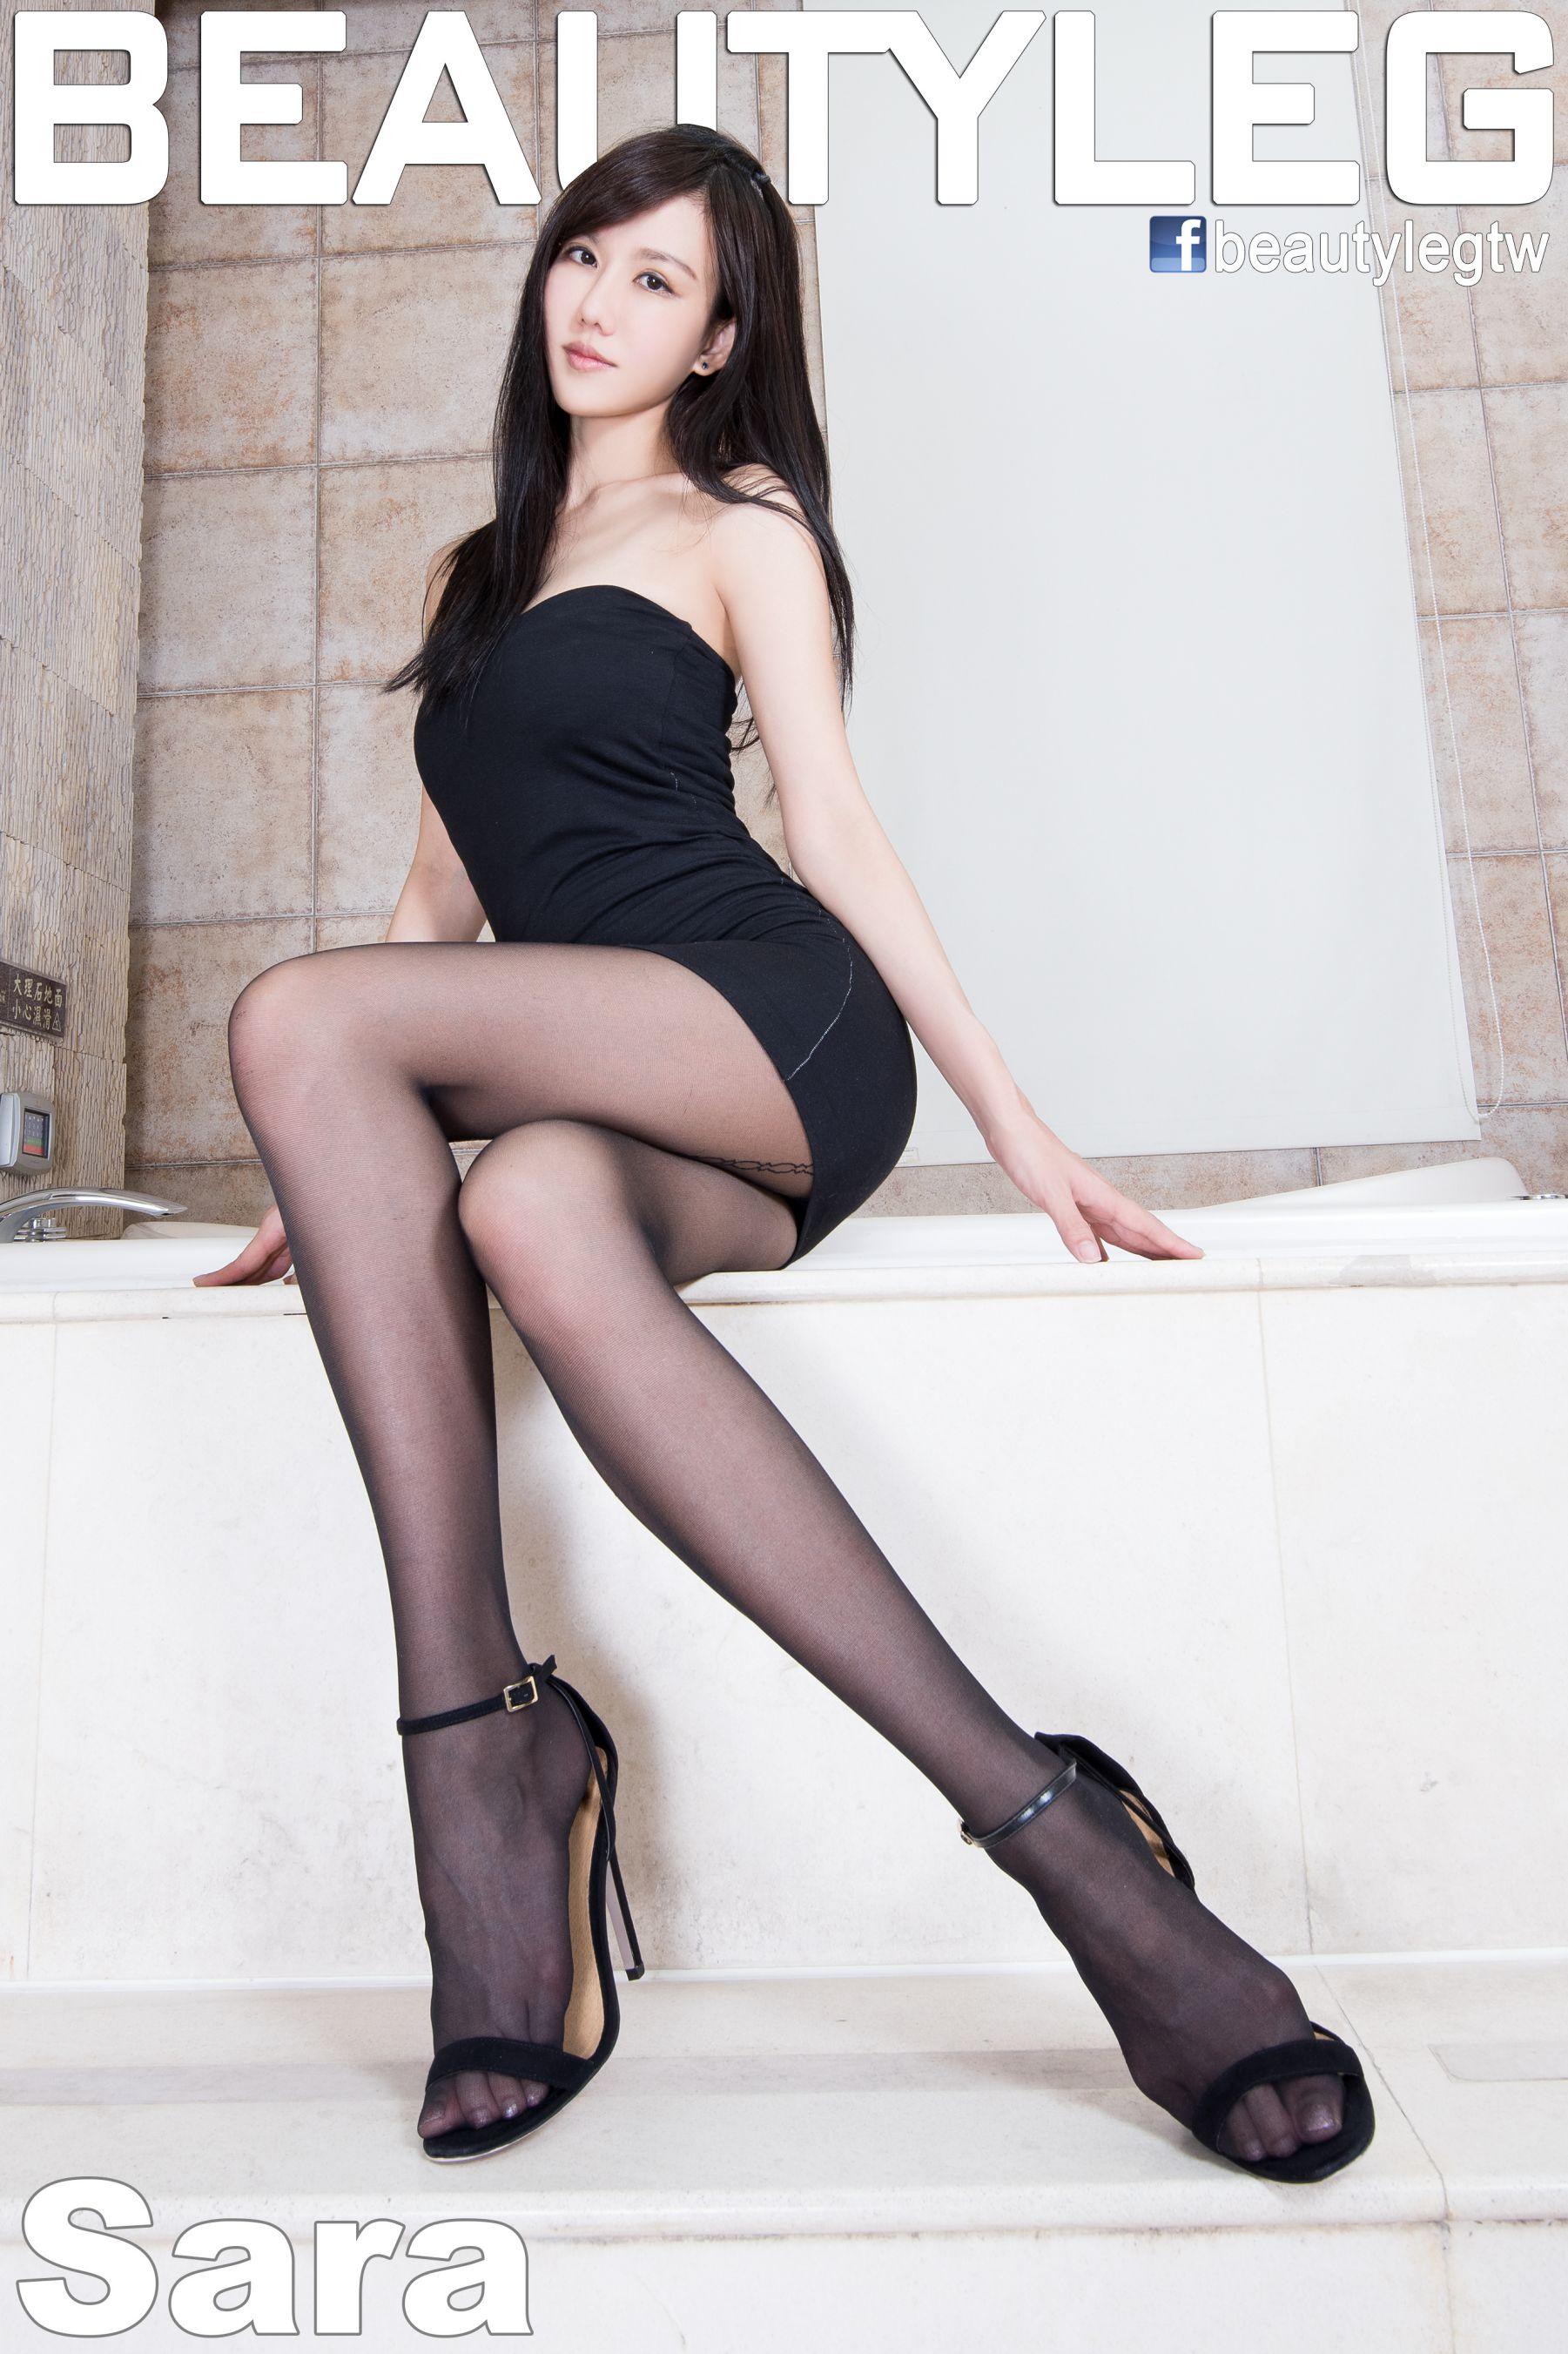 VOL.1603 [Beautyleg]美腿黑丝高跟高跟凉鞋:林瑞瑜(Beautyleg Sara,腿模Sara)高品质写真套图(53P)